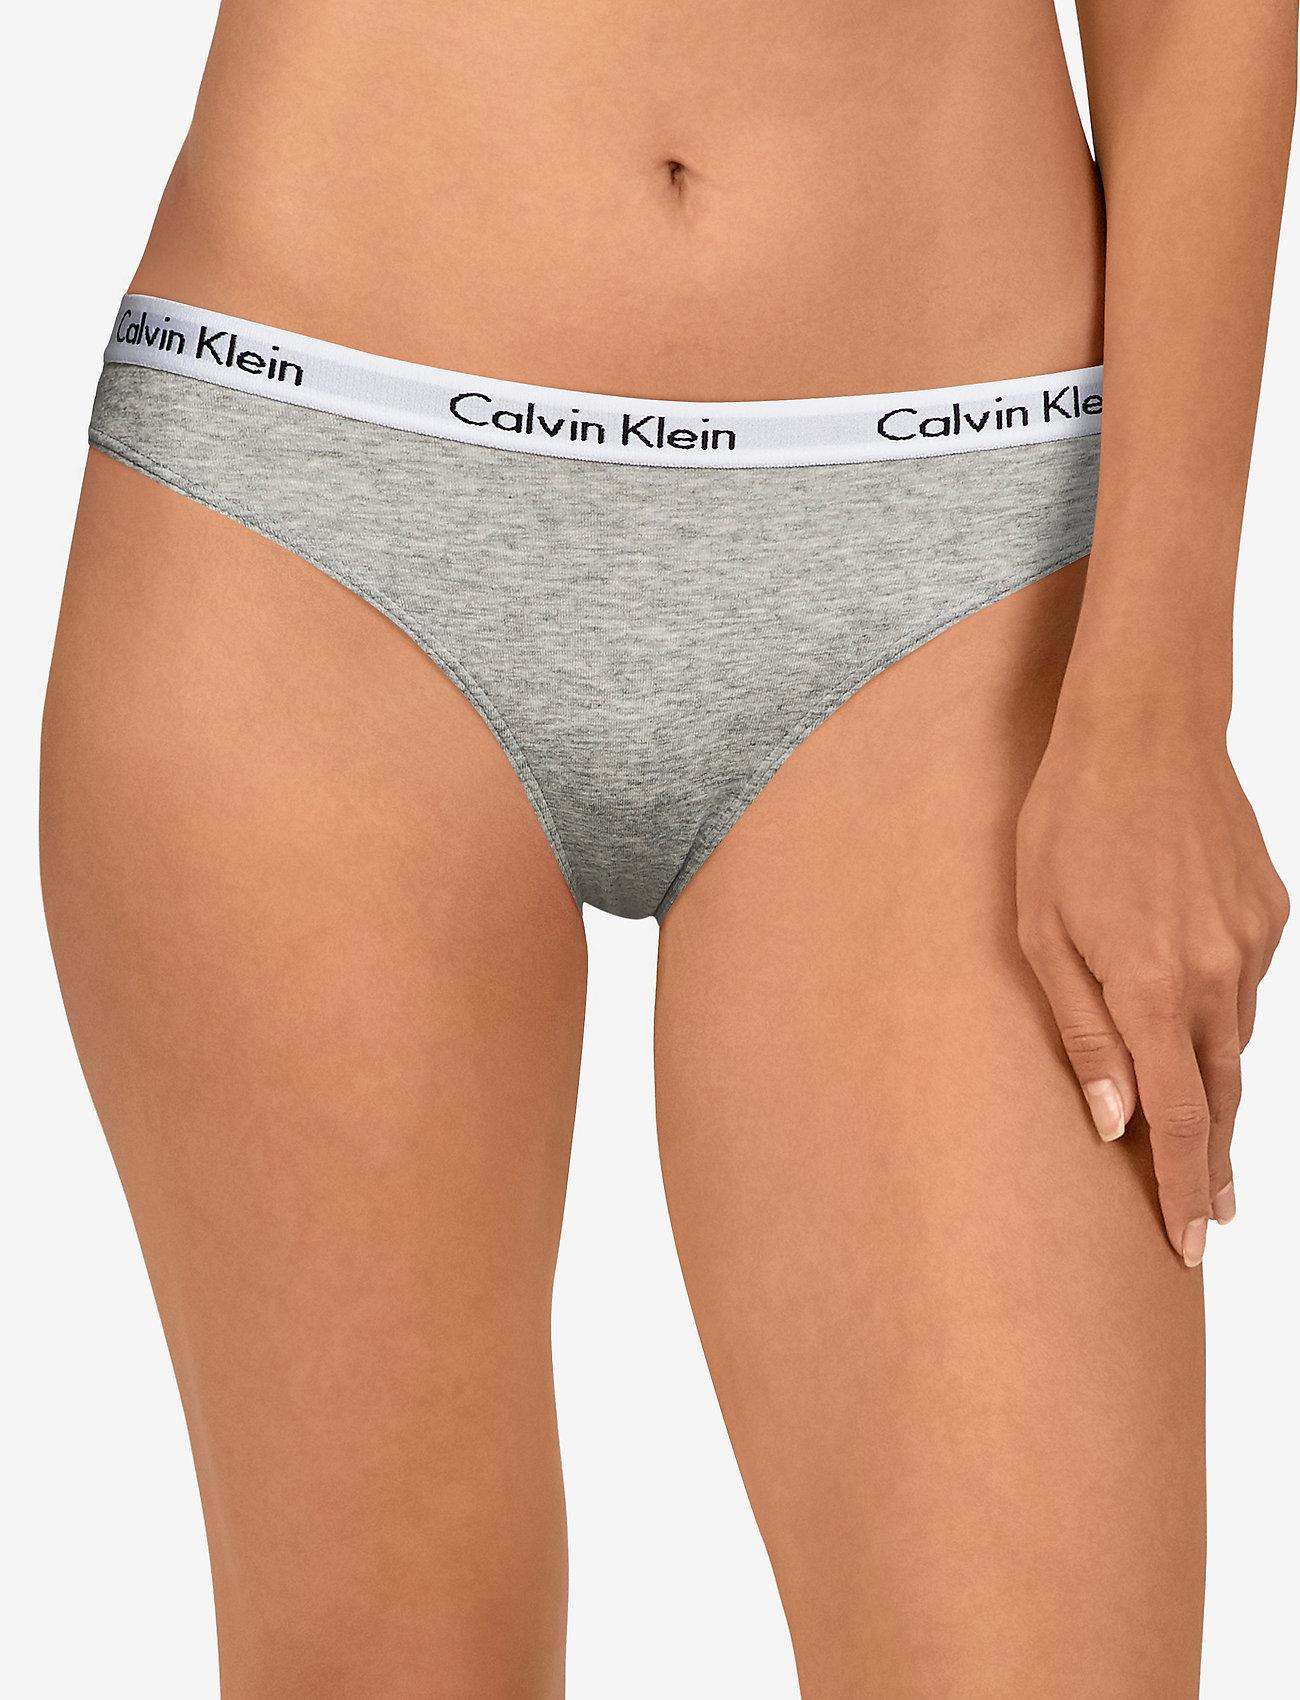 Calvin Klein BIKINI 3PK - POMELO/POLAR LIGHTS/GREY